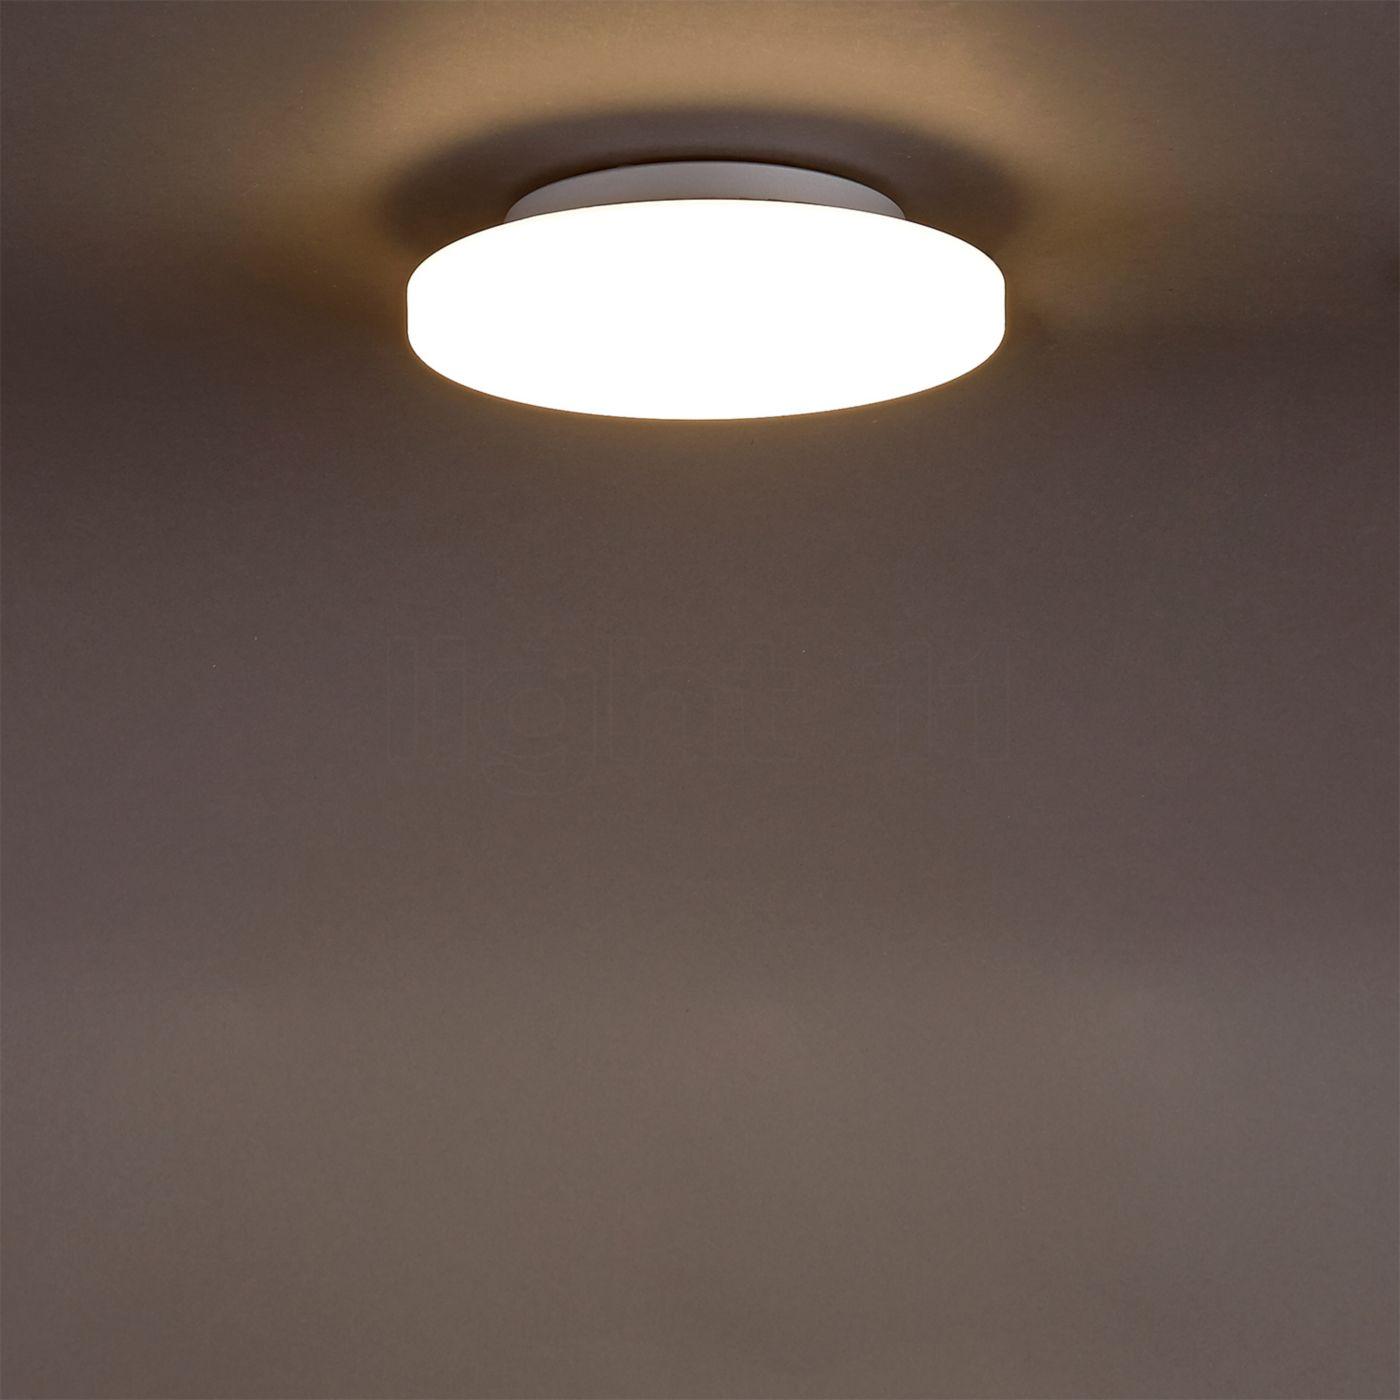 Buy ribag licht punto led wall ceiling light at light11 eu